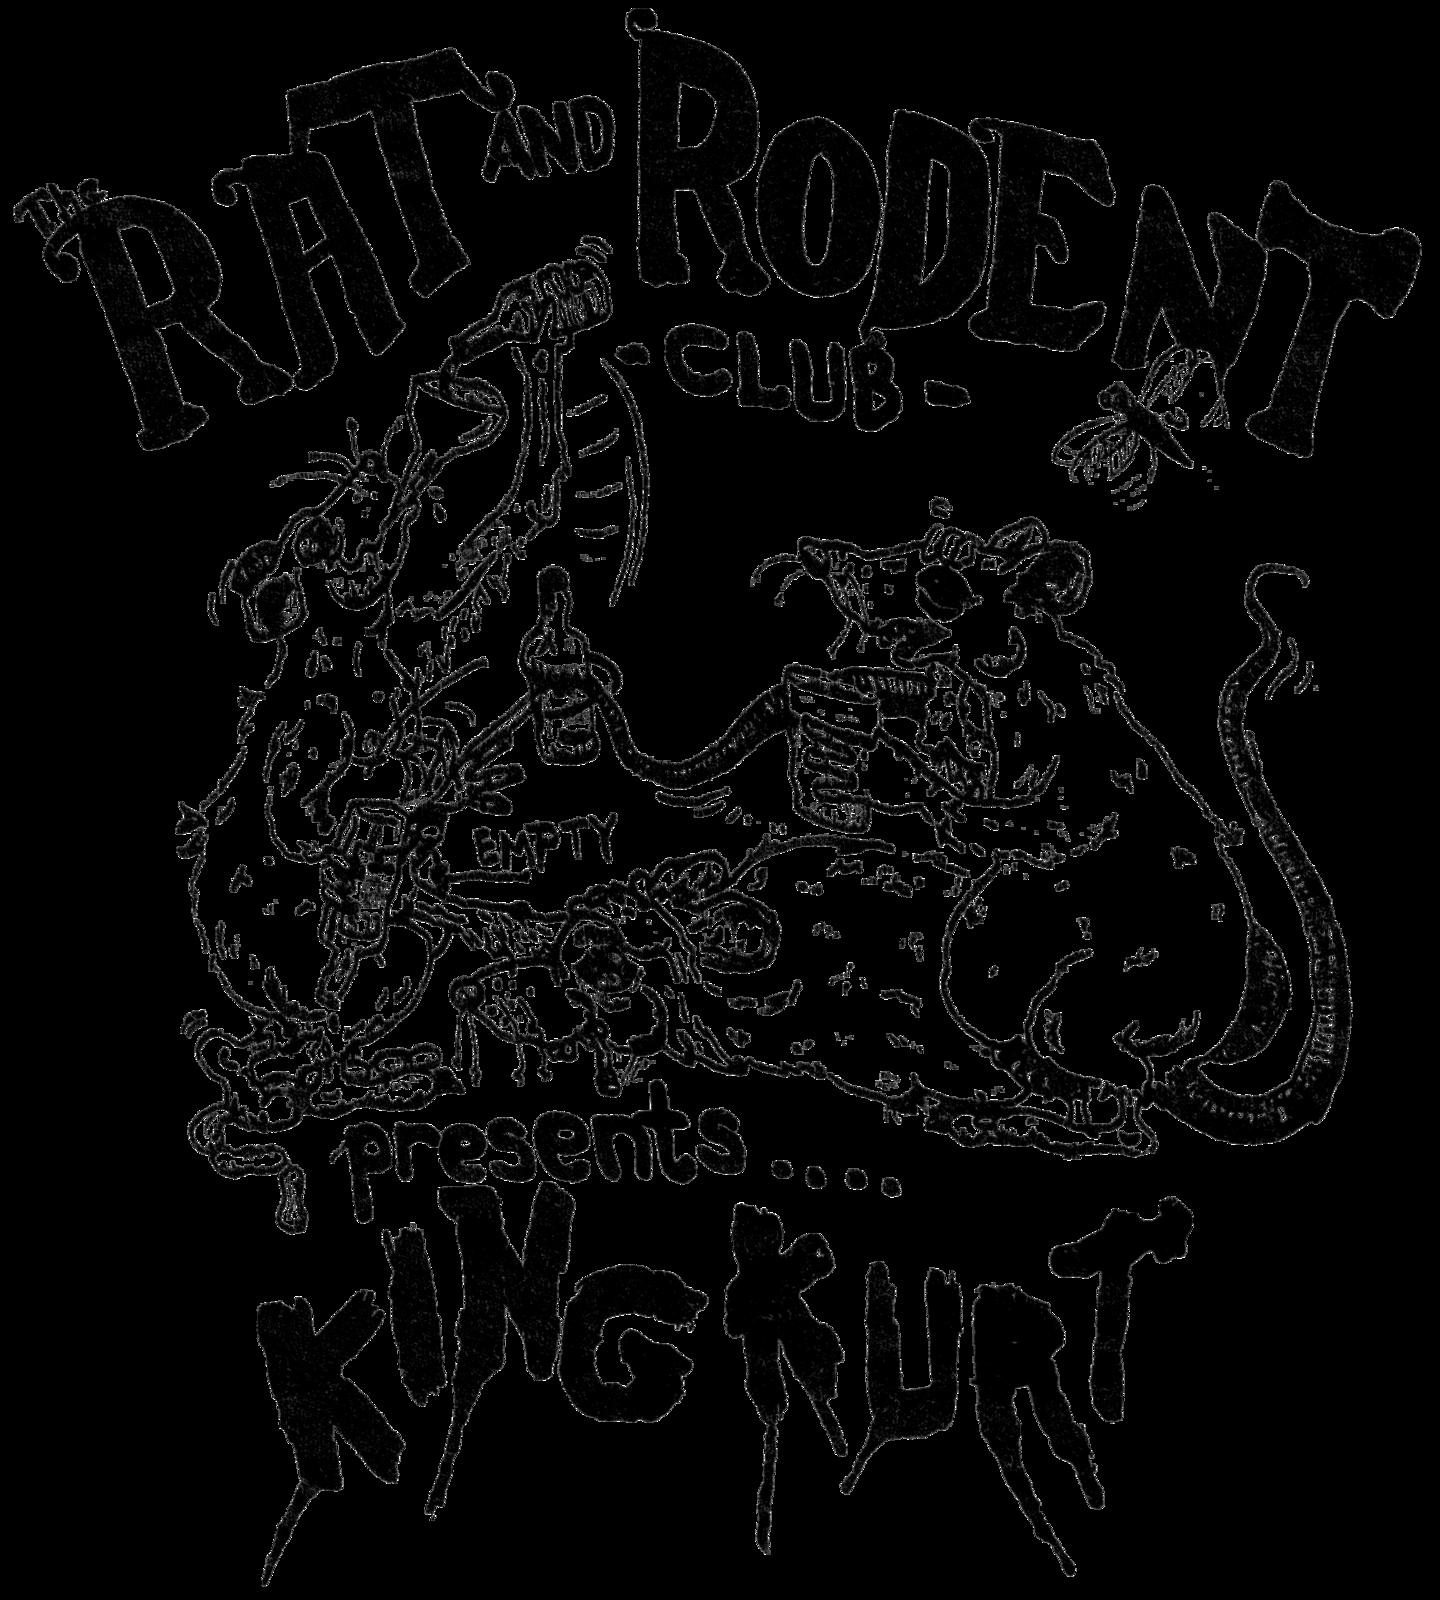 Rat & Rodent Club ladies t-shirt rockabilly psychobilly king kurt cramps punk